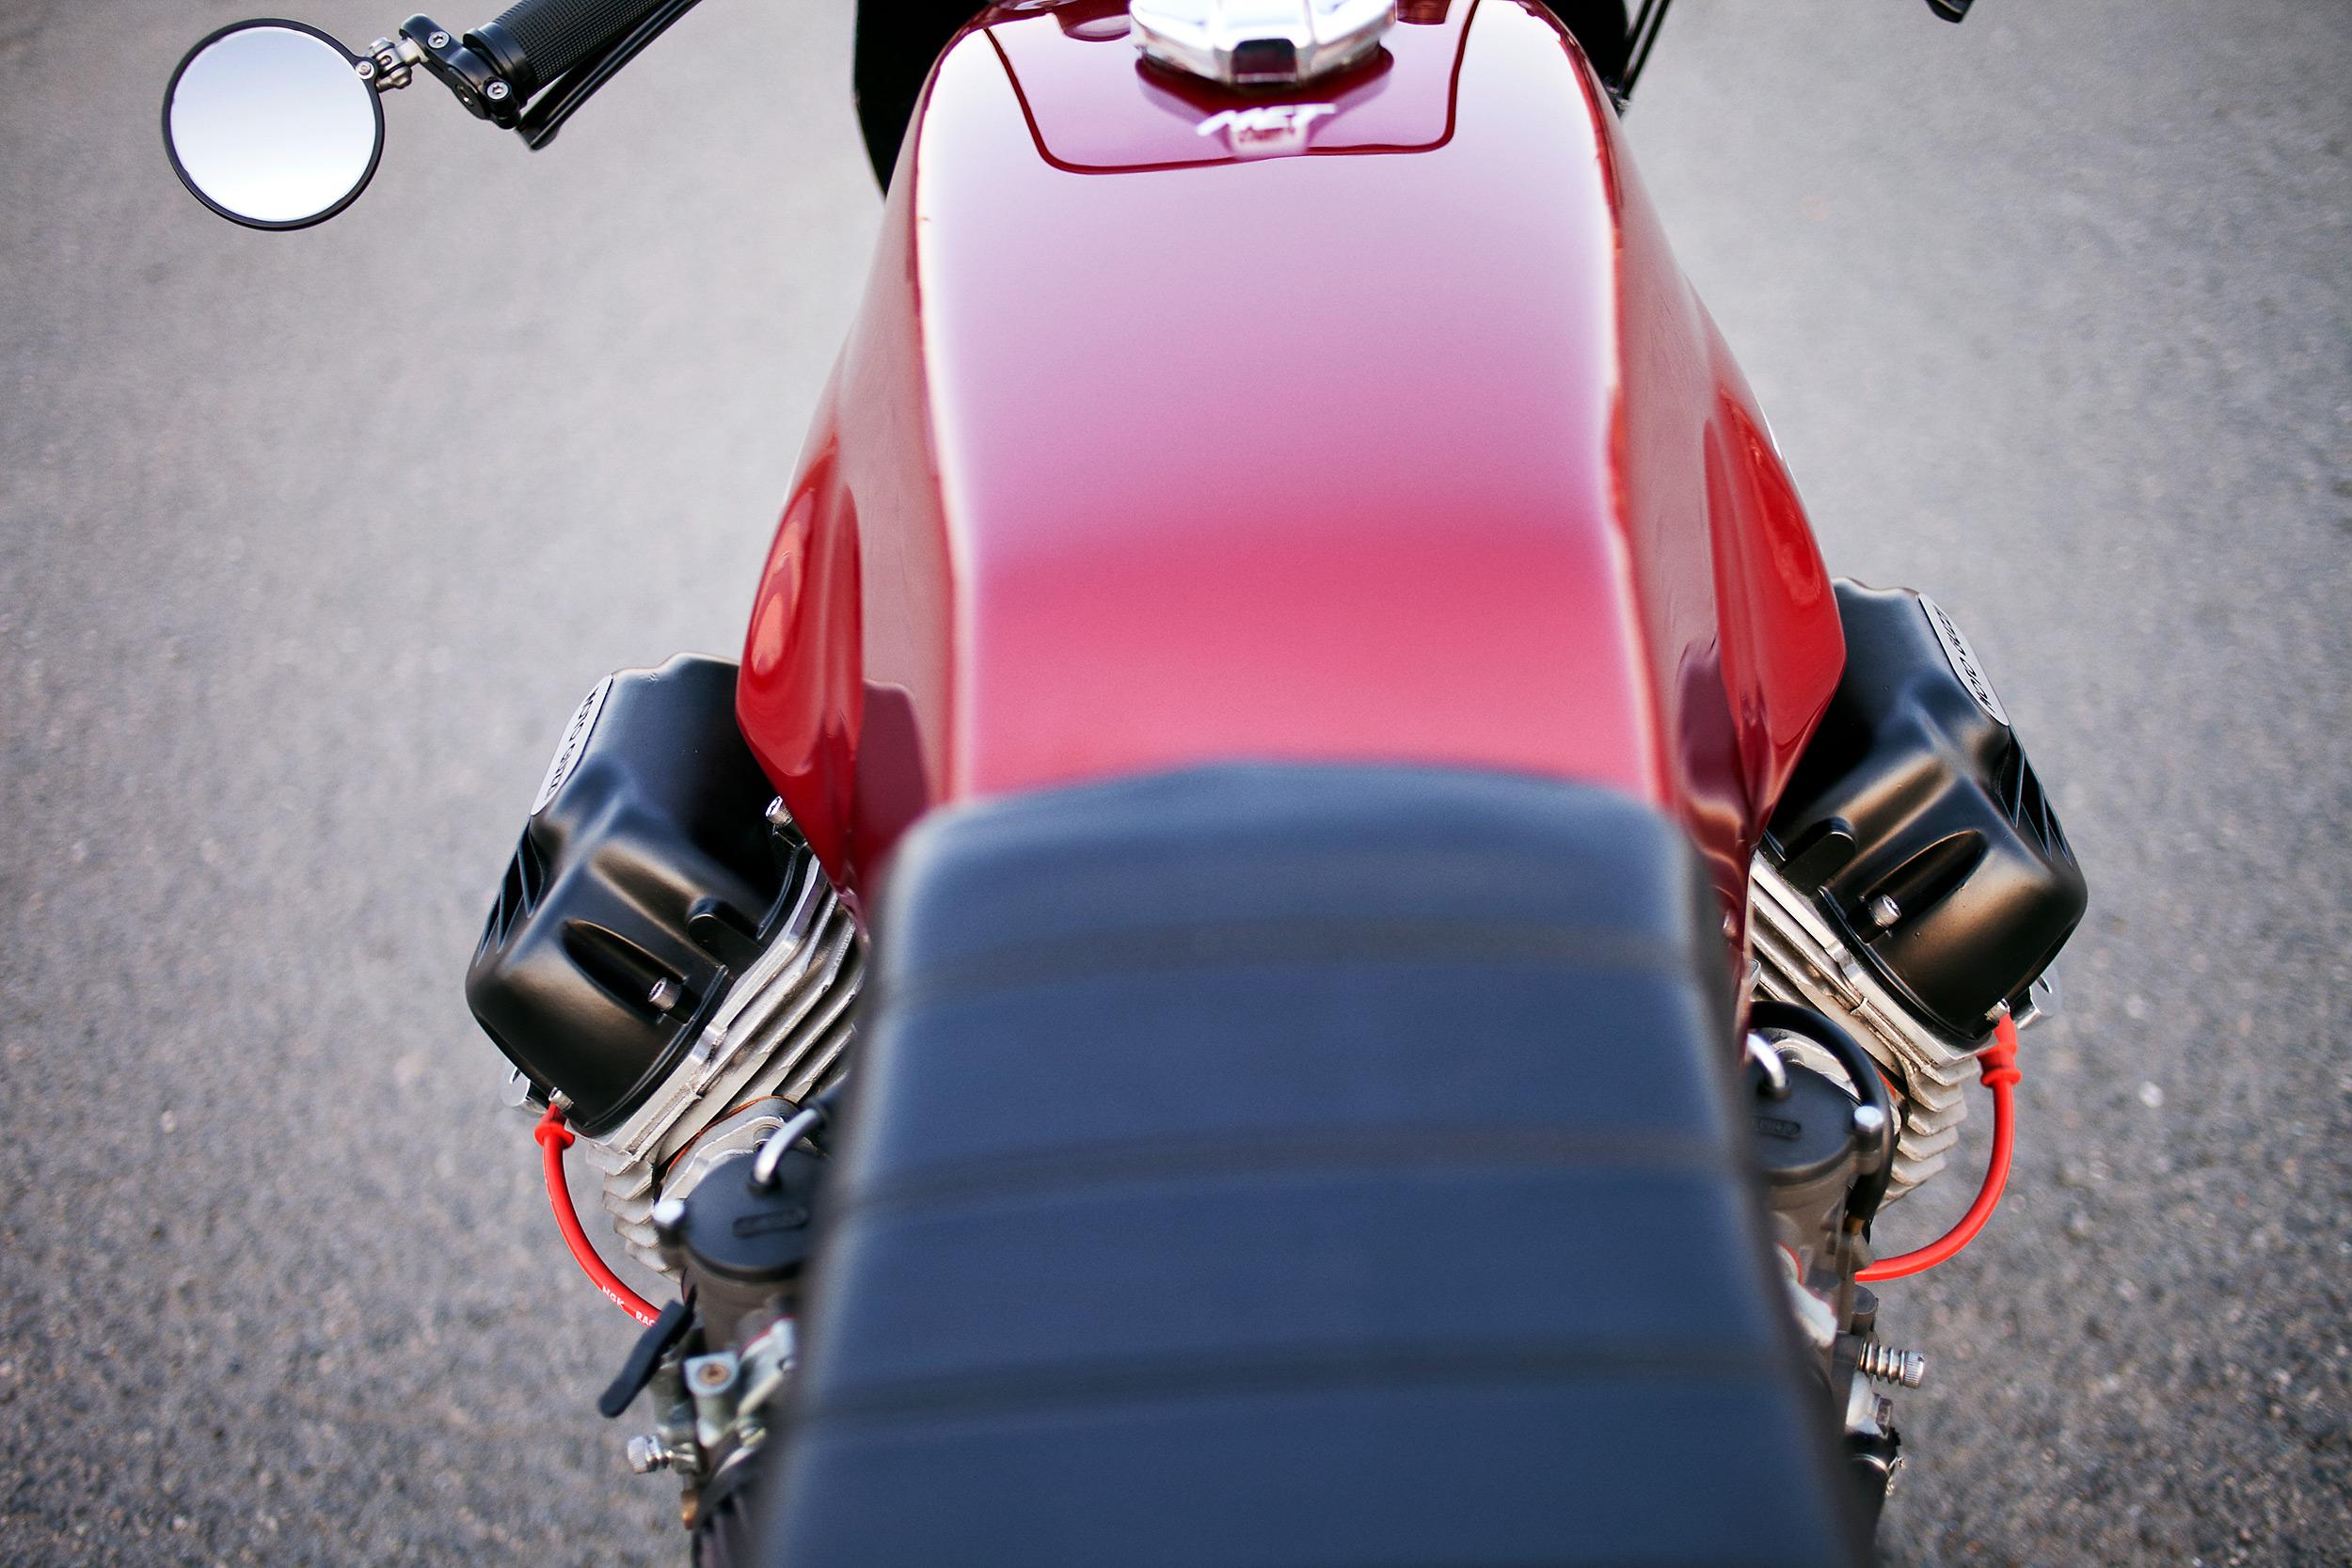 1977 Moto Guzzi lemans 1 custom tank paint